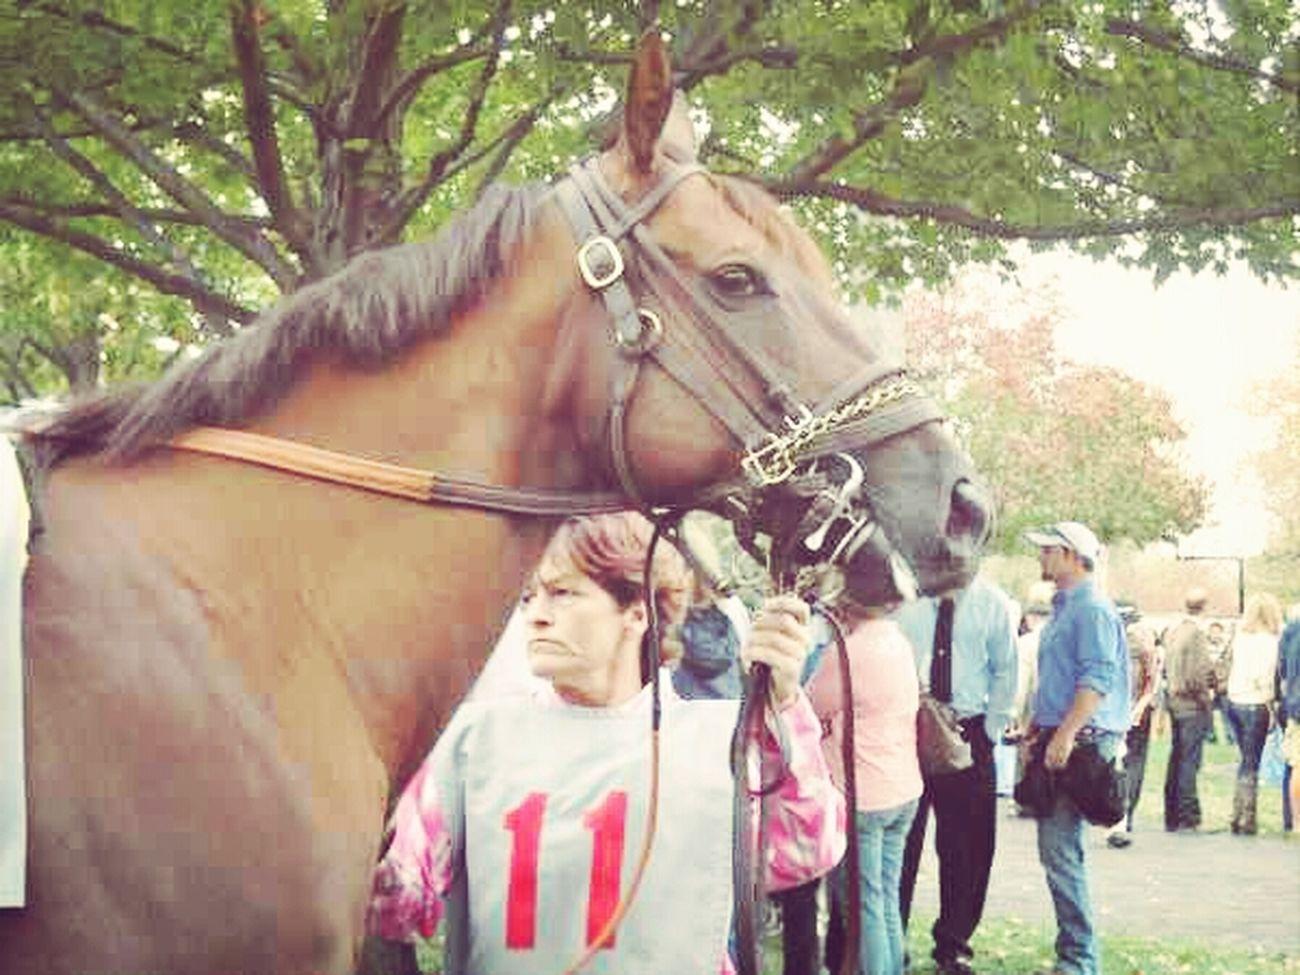 Horses Racetrack Fall Meet Keeneland